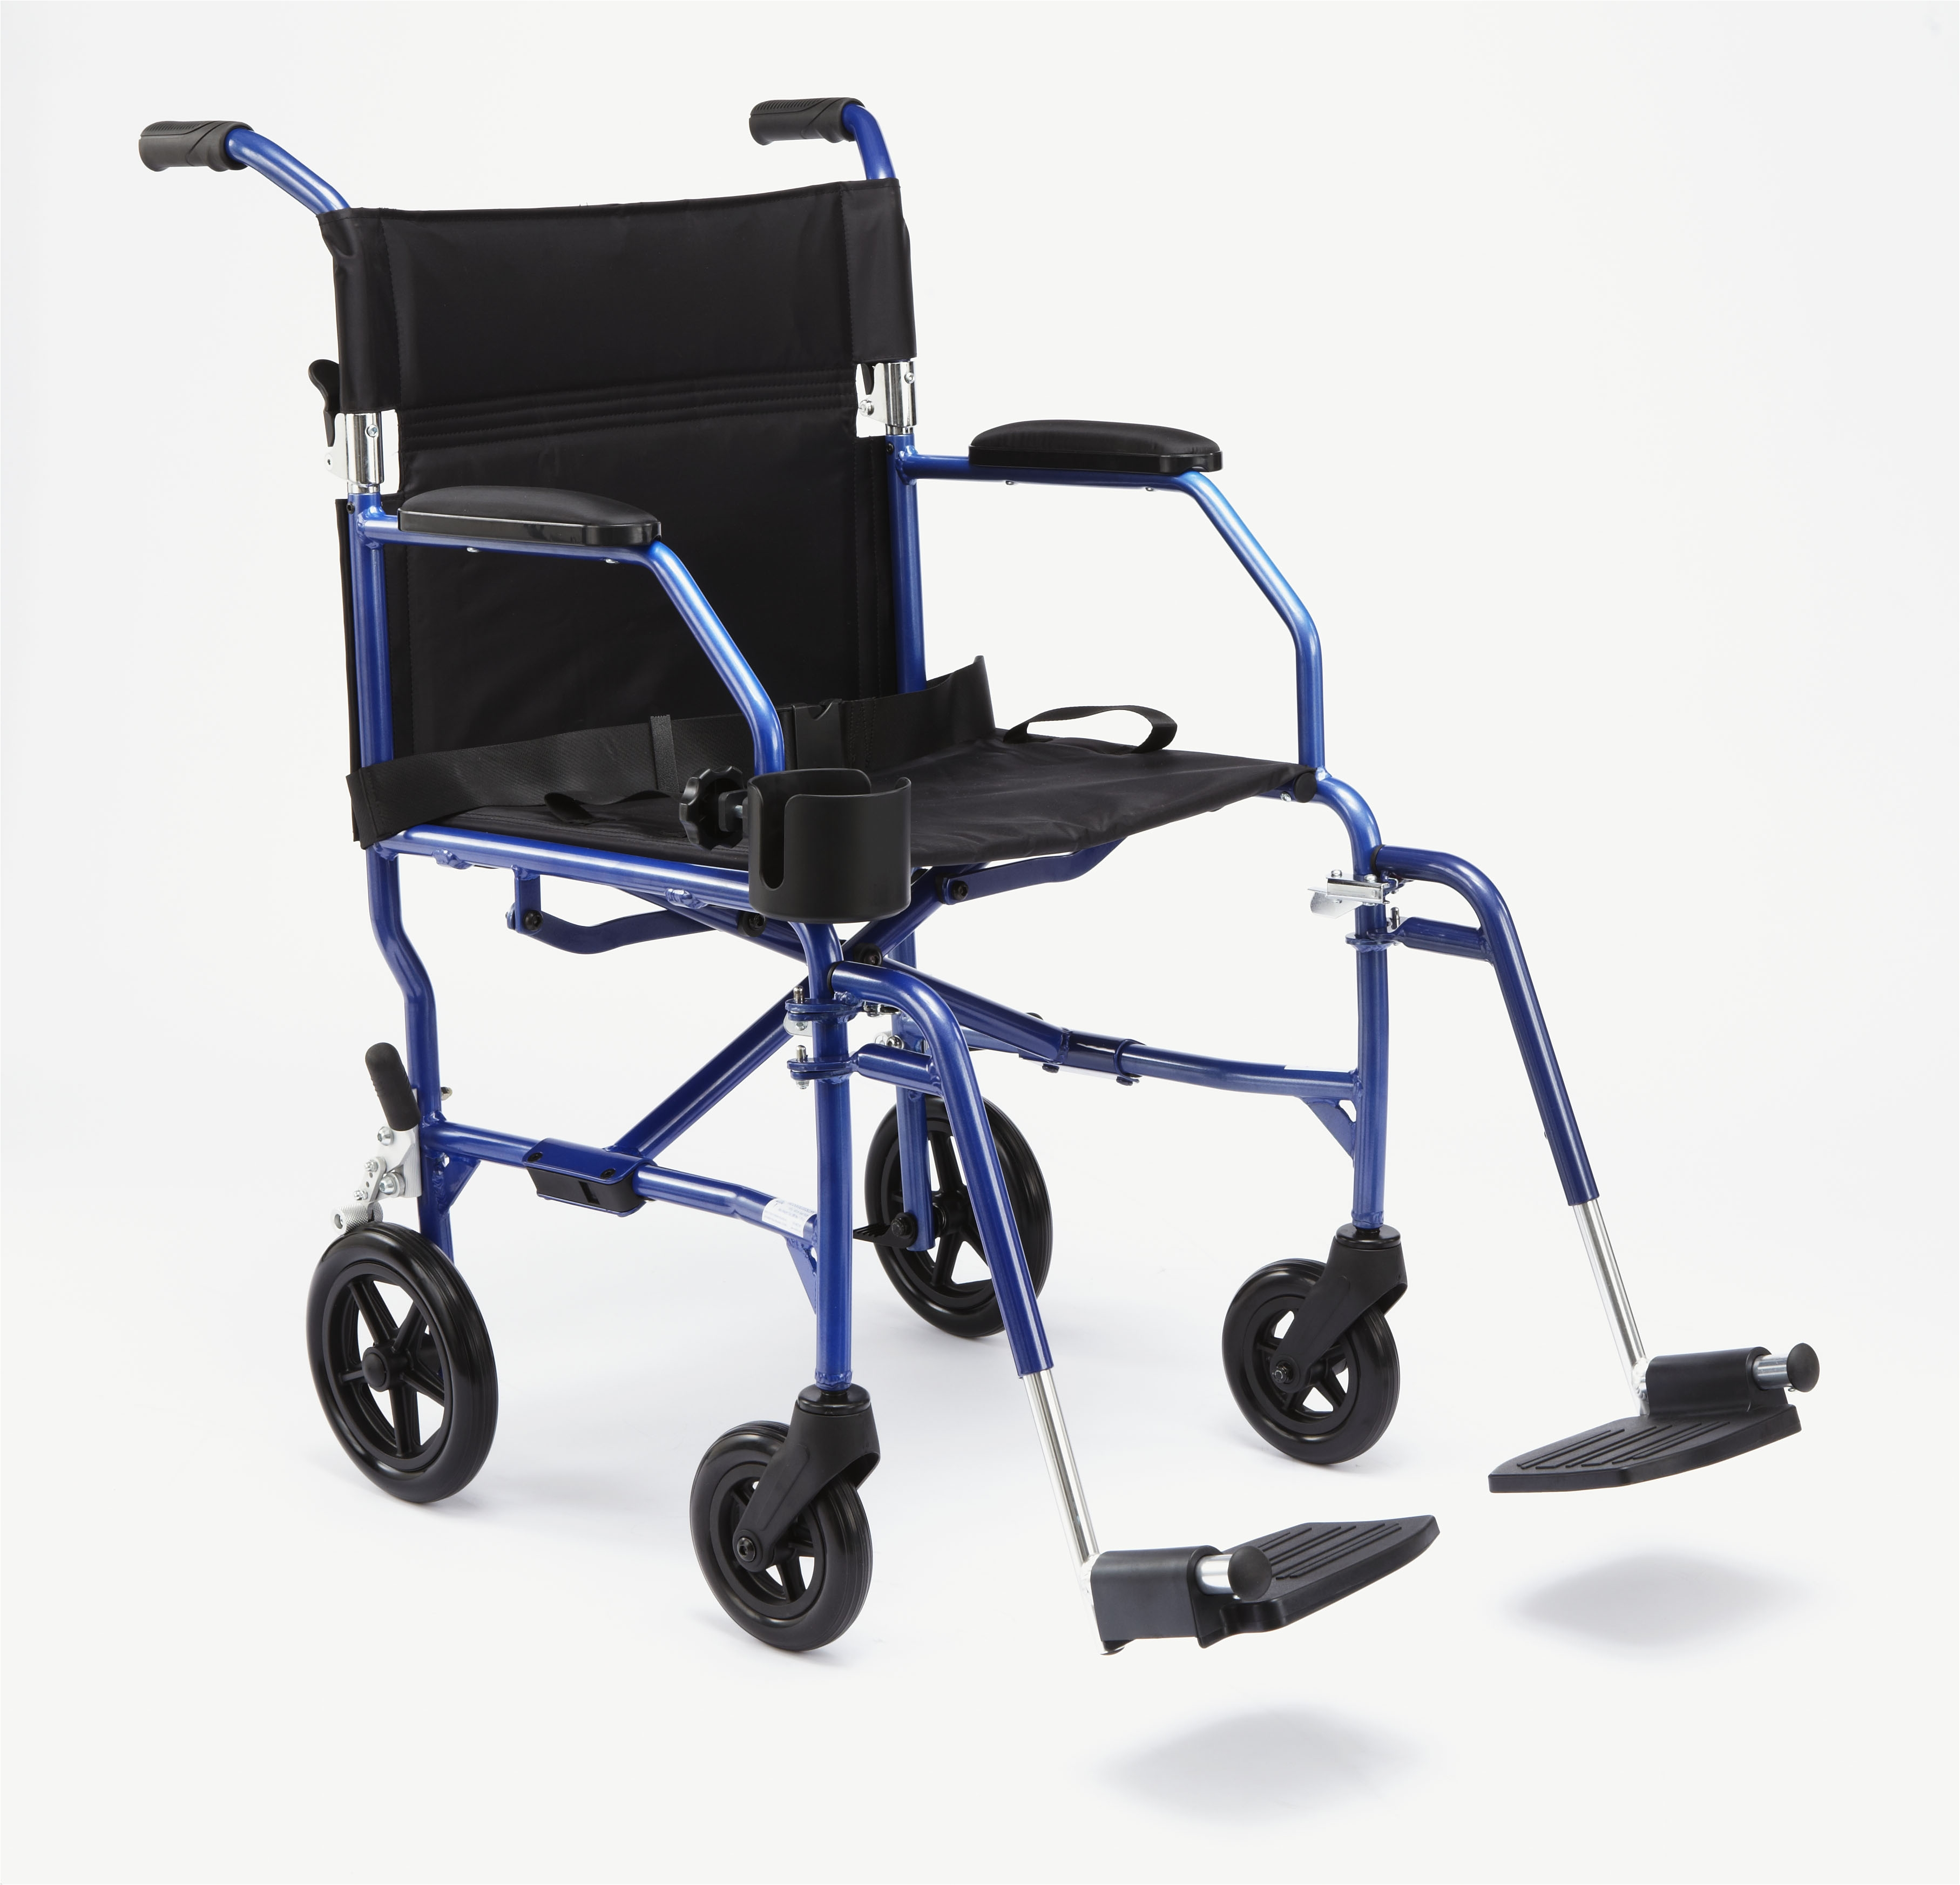 Transport Chair Walmart Canada Chair Transport Wheelchair with 12 Rear Wheels Sunrise Medical